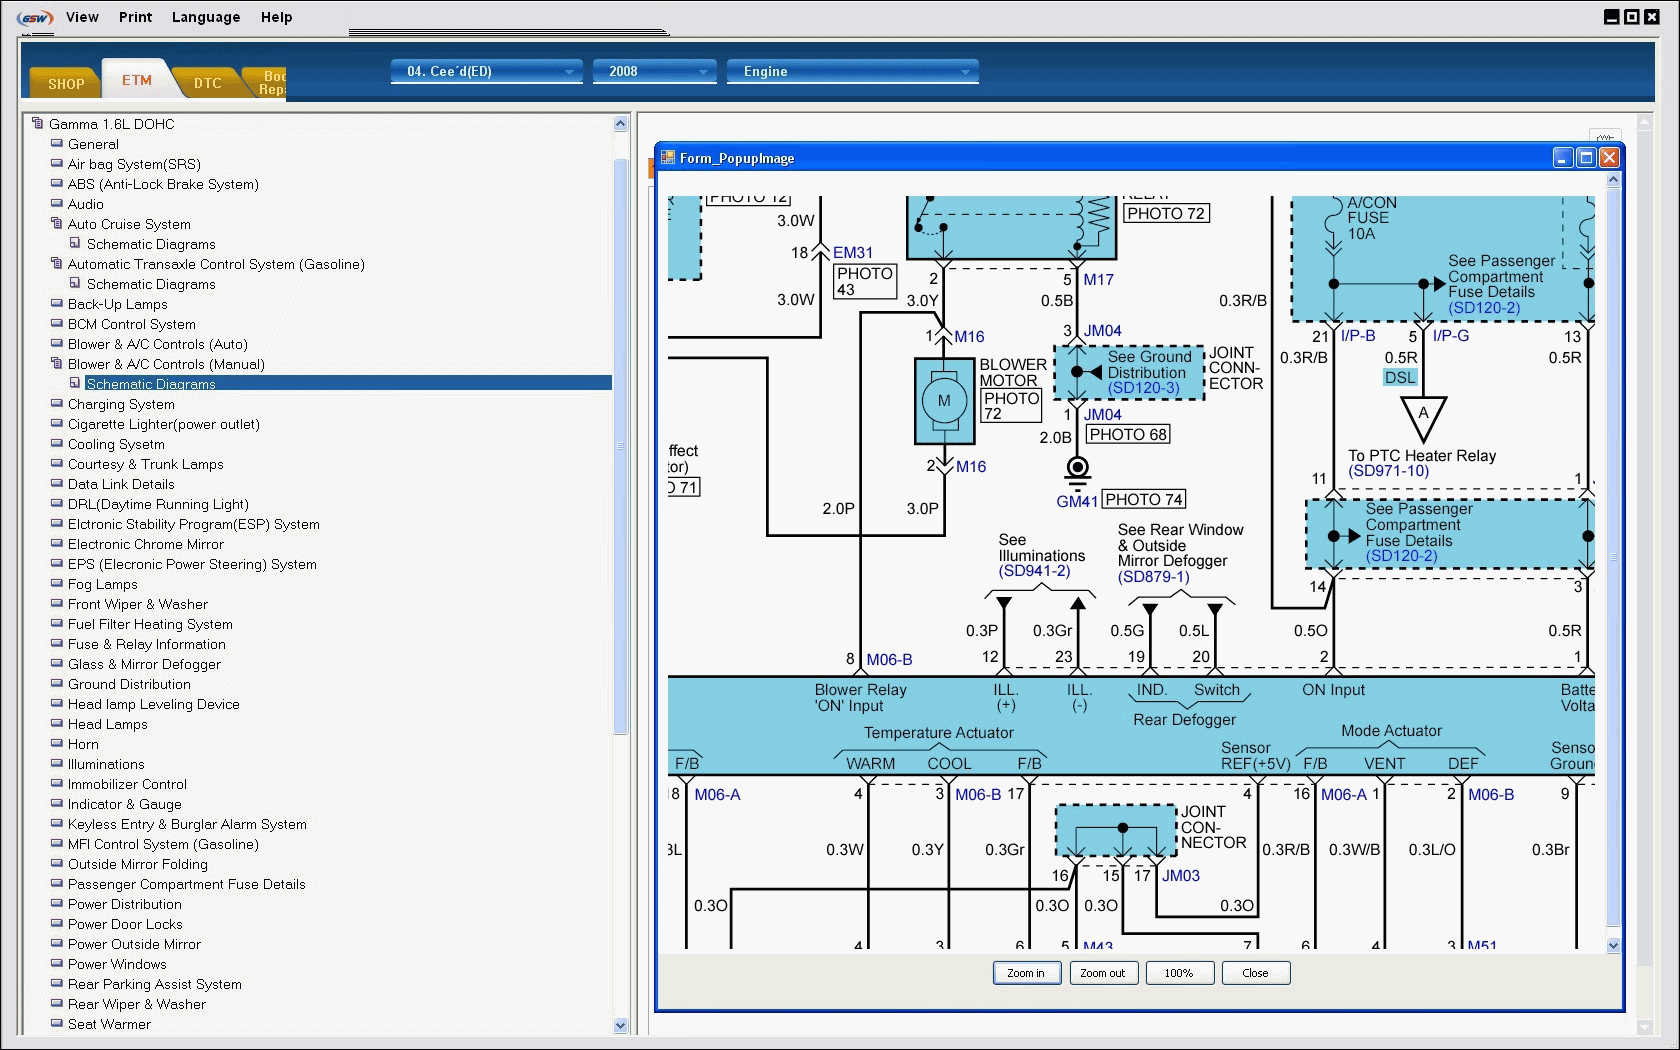 UNIGROUP - Каталоги, руководства и инструкции к технике CLAAS